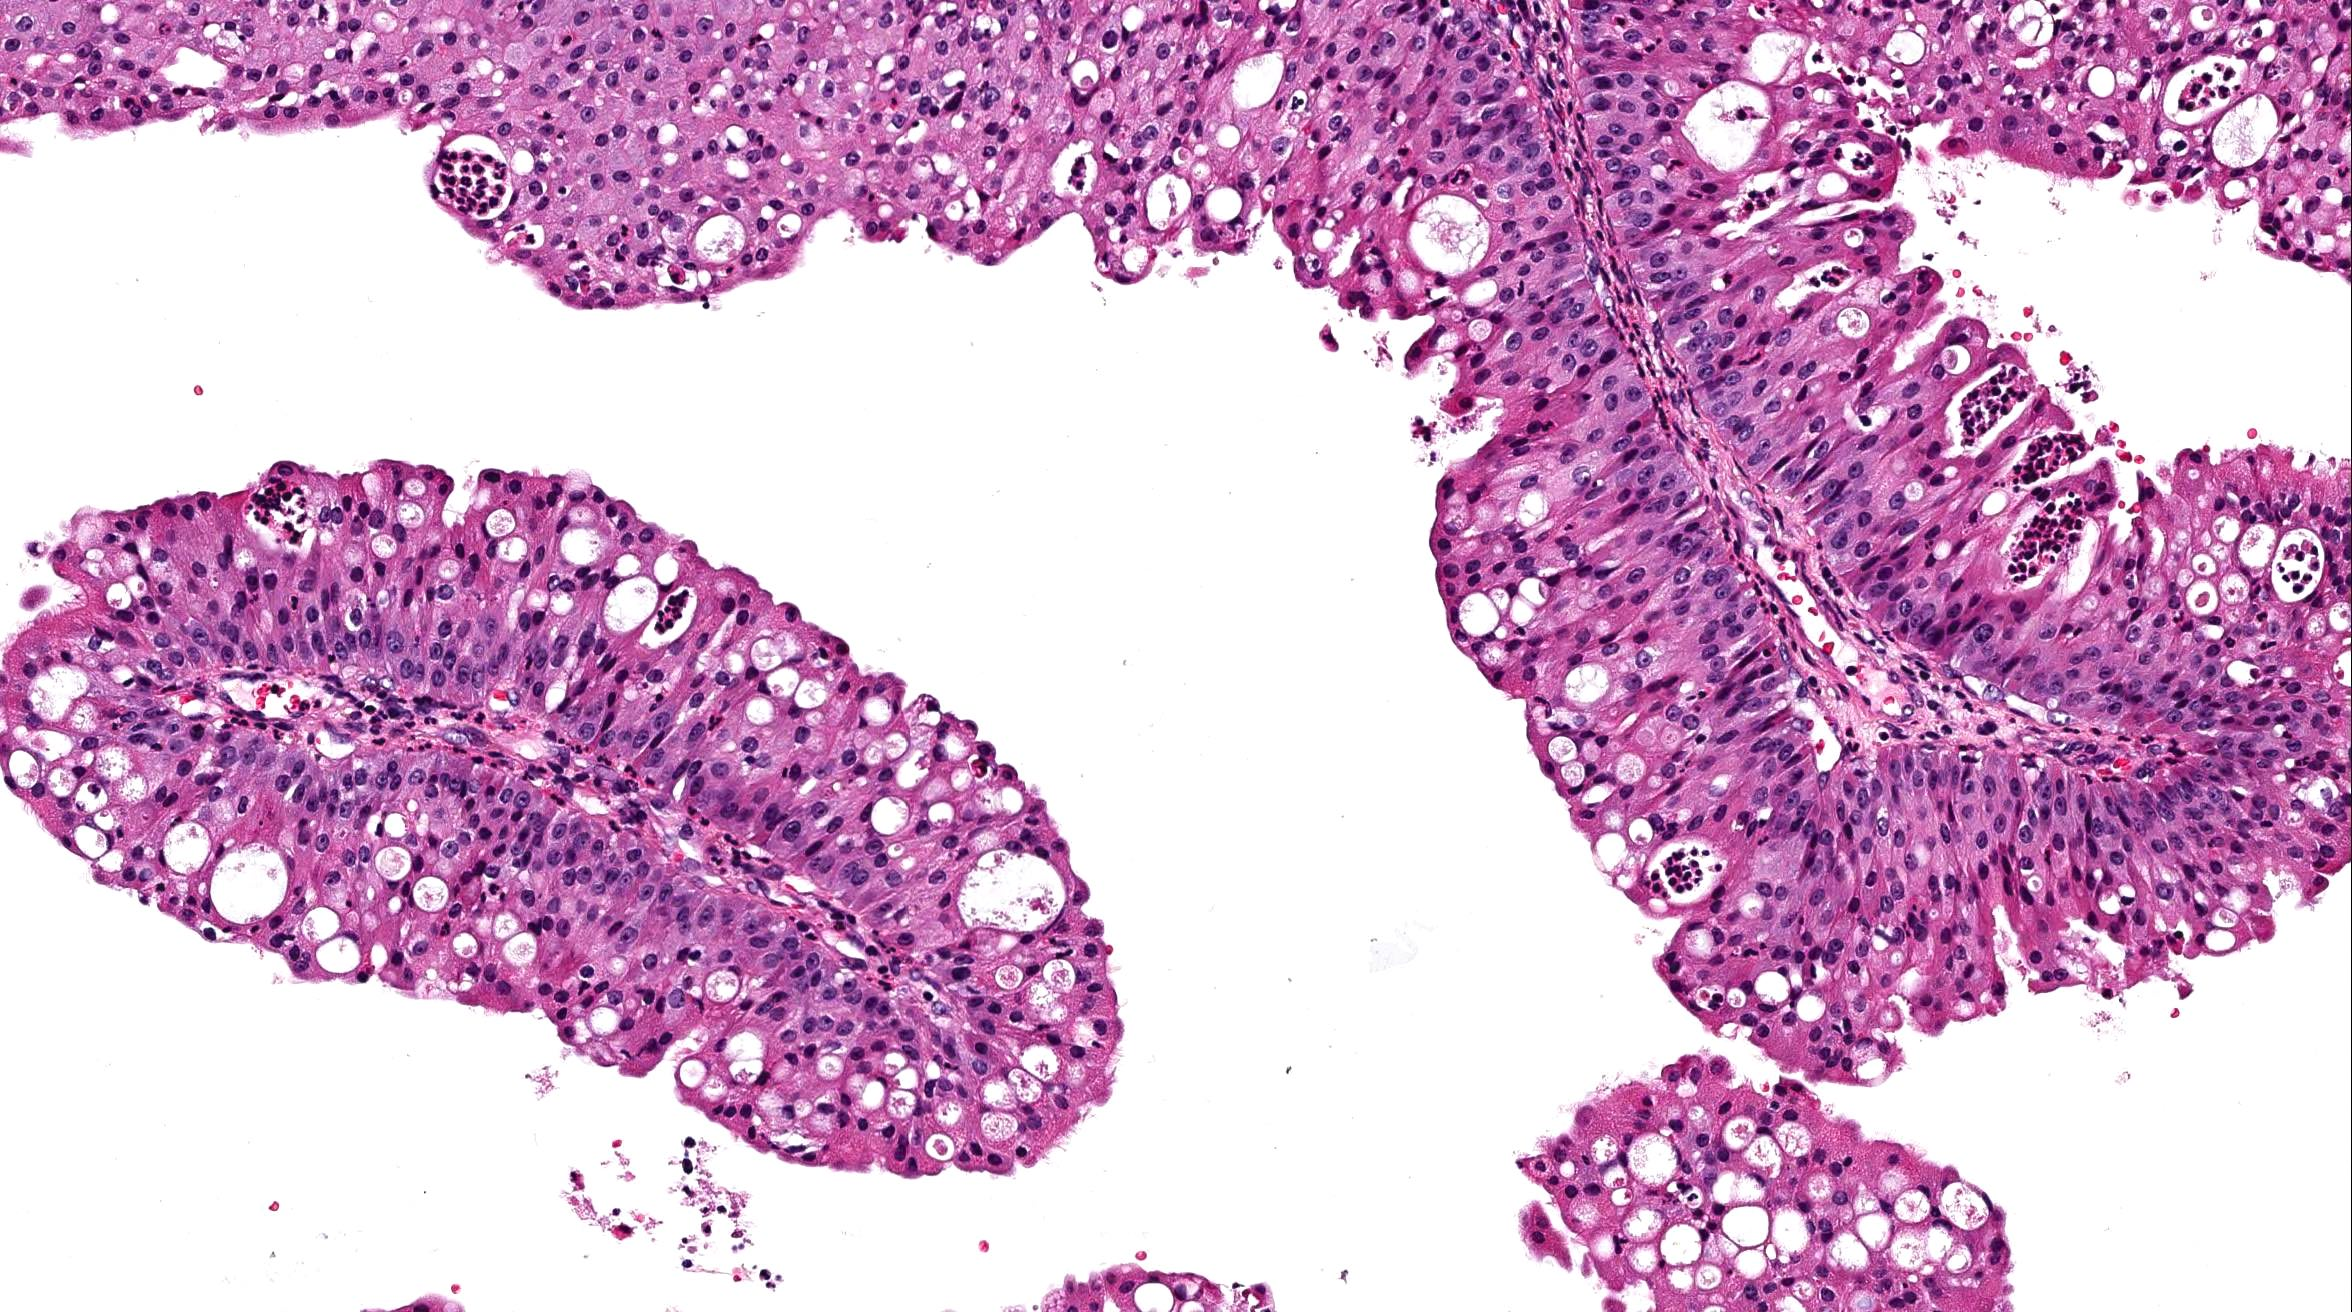 papilloma nasal pathology outlines